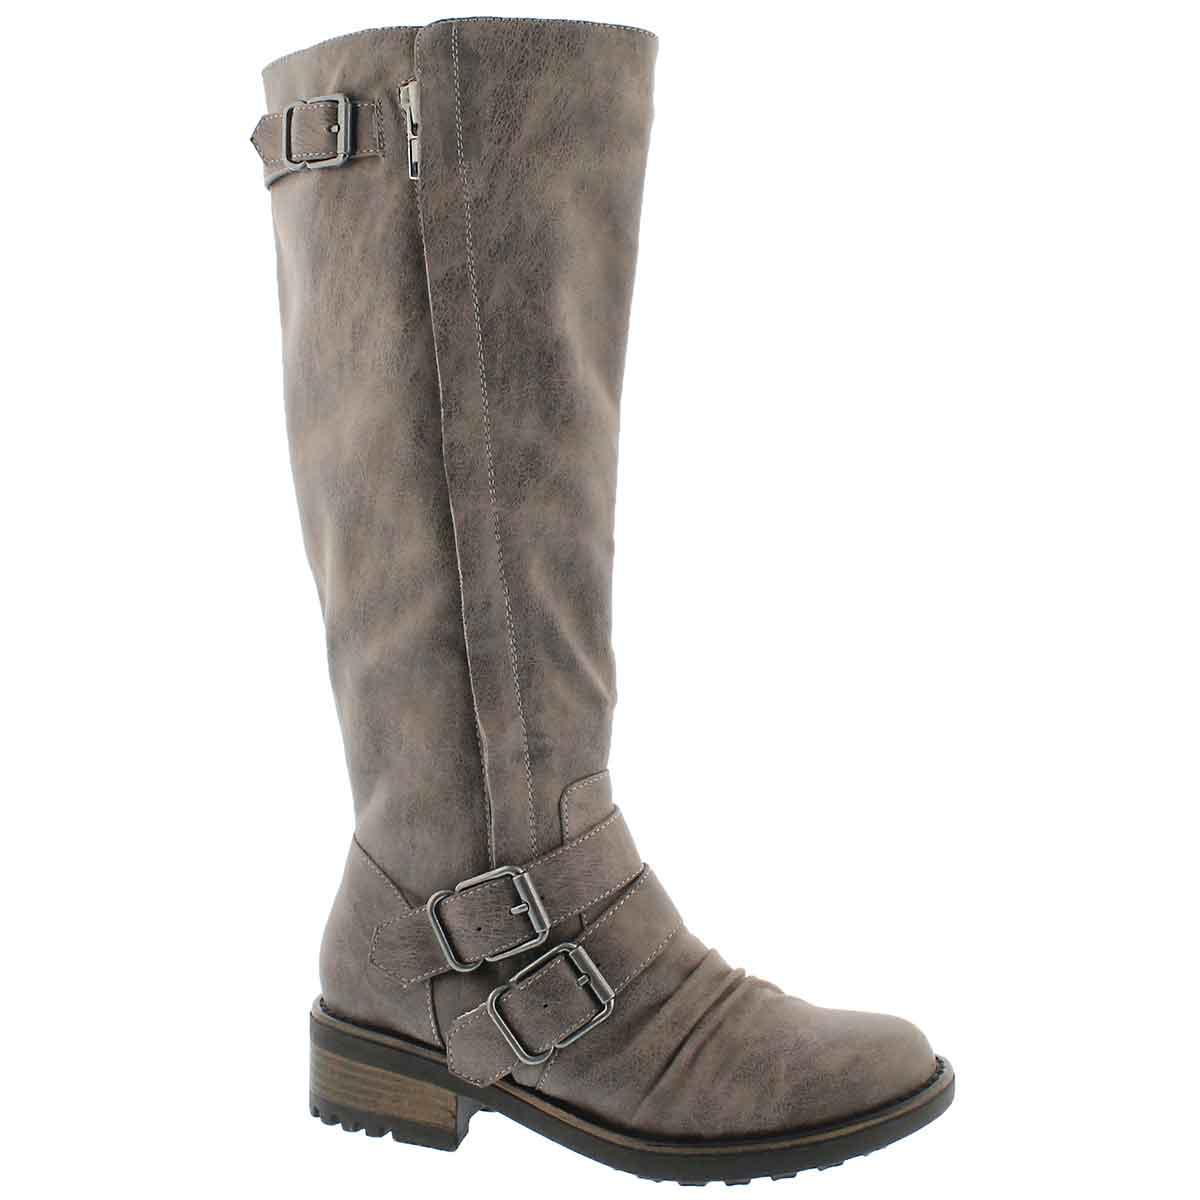 Women's BLIXI III mole riding boots